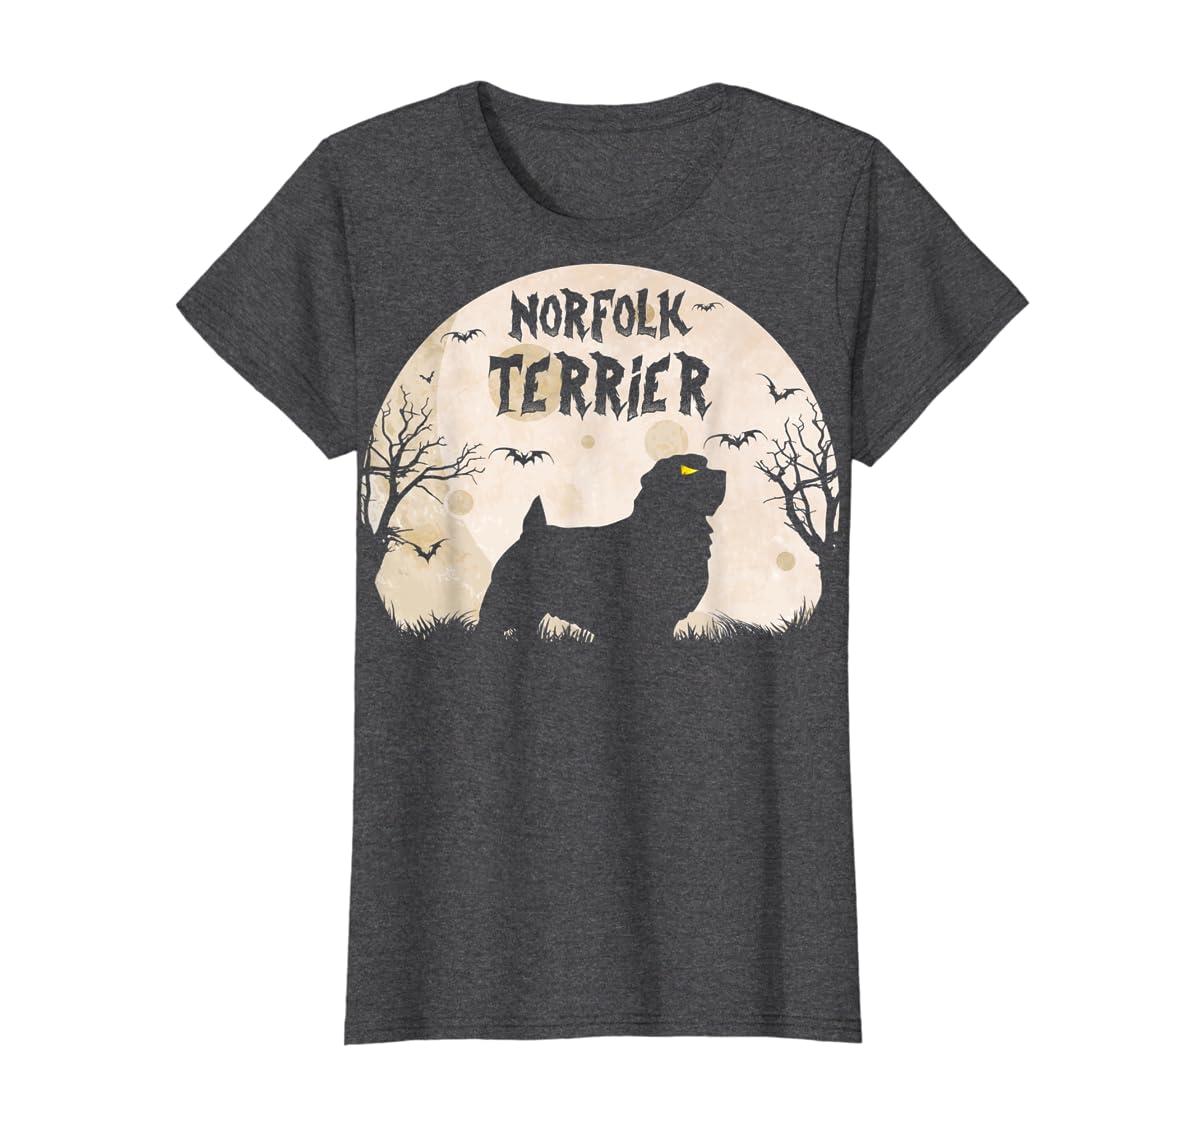 Halloween Horror Norfolk Terrier  T-Shirt-Women's T-Shirt-Dark Heather